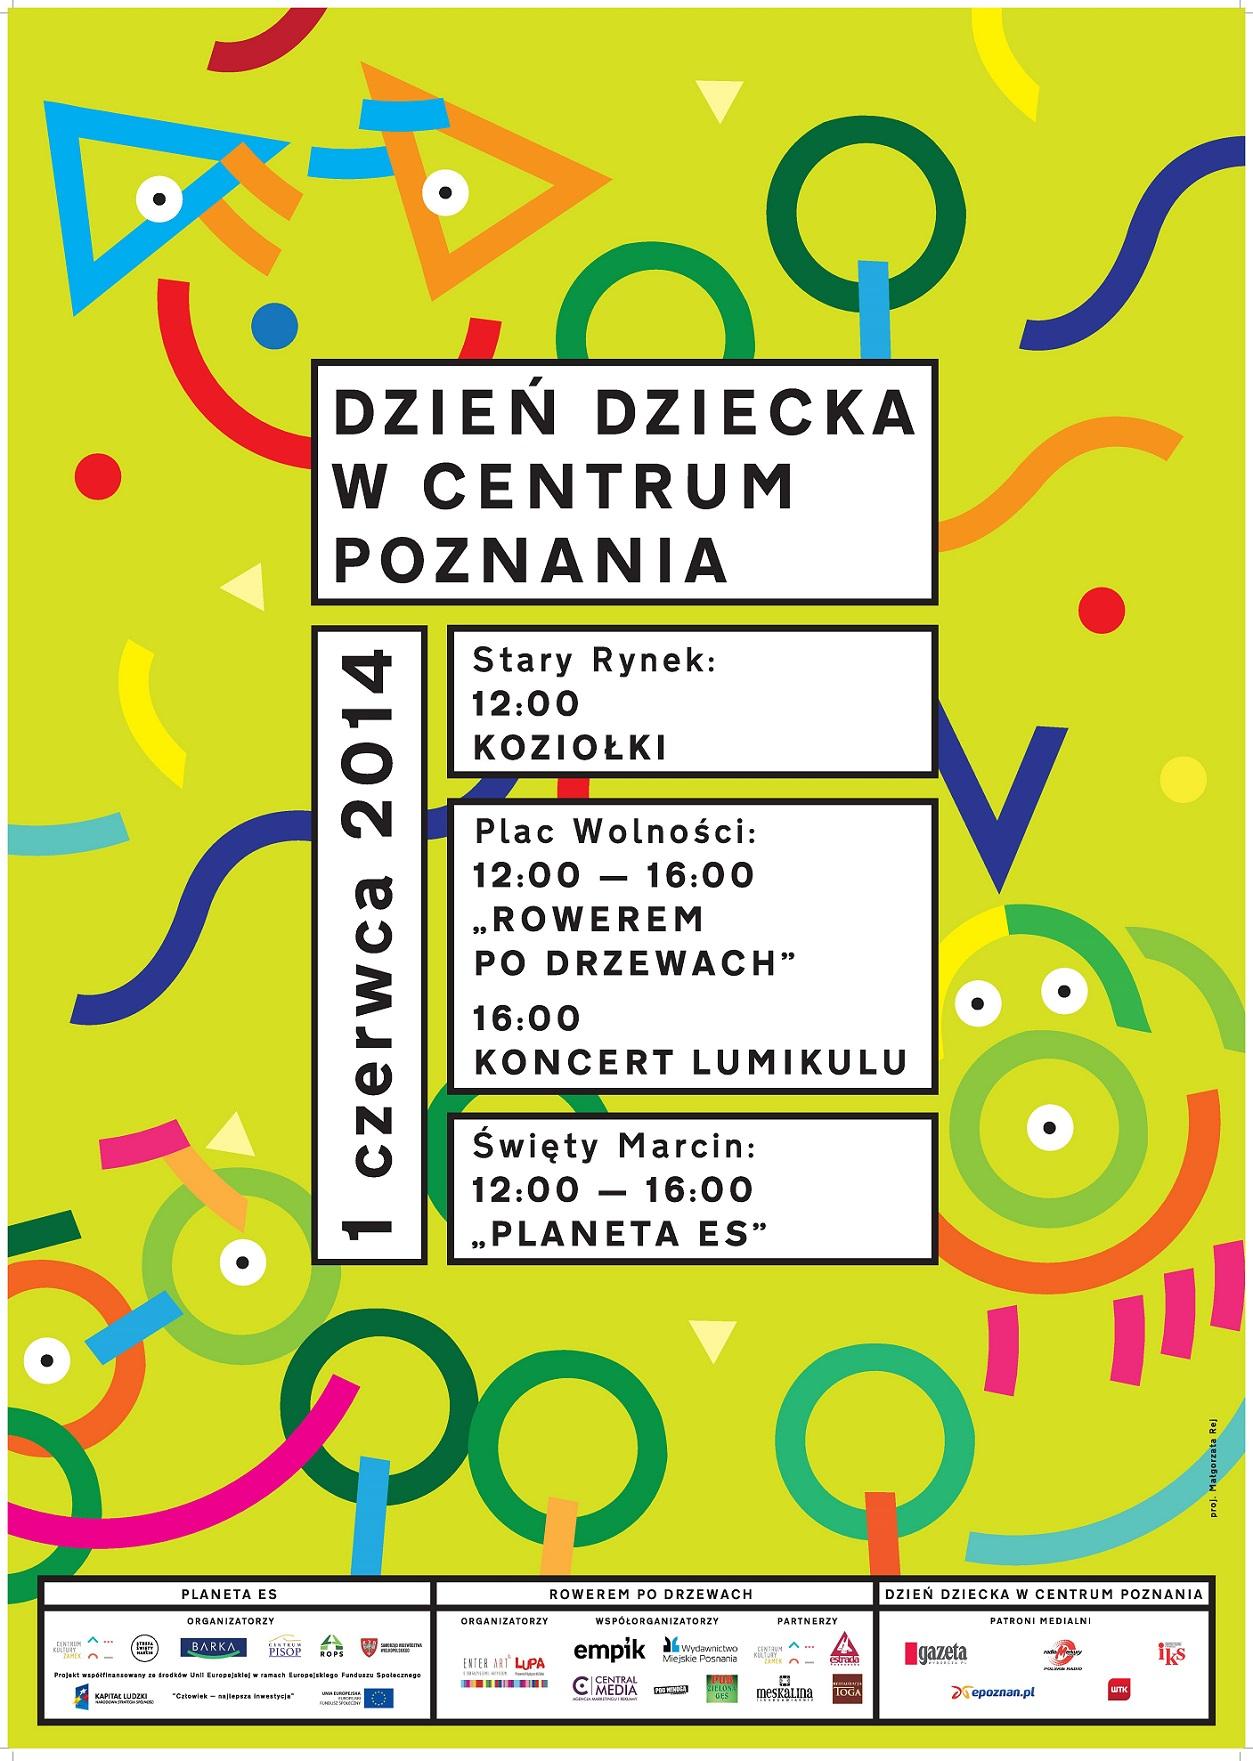 PLAKAT_DZIEN-DZIECKA_01.06.2014